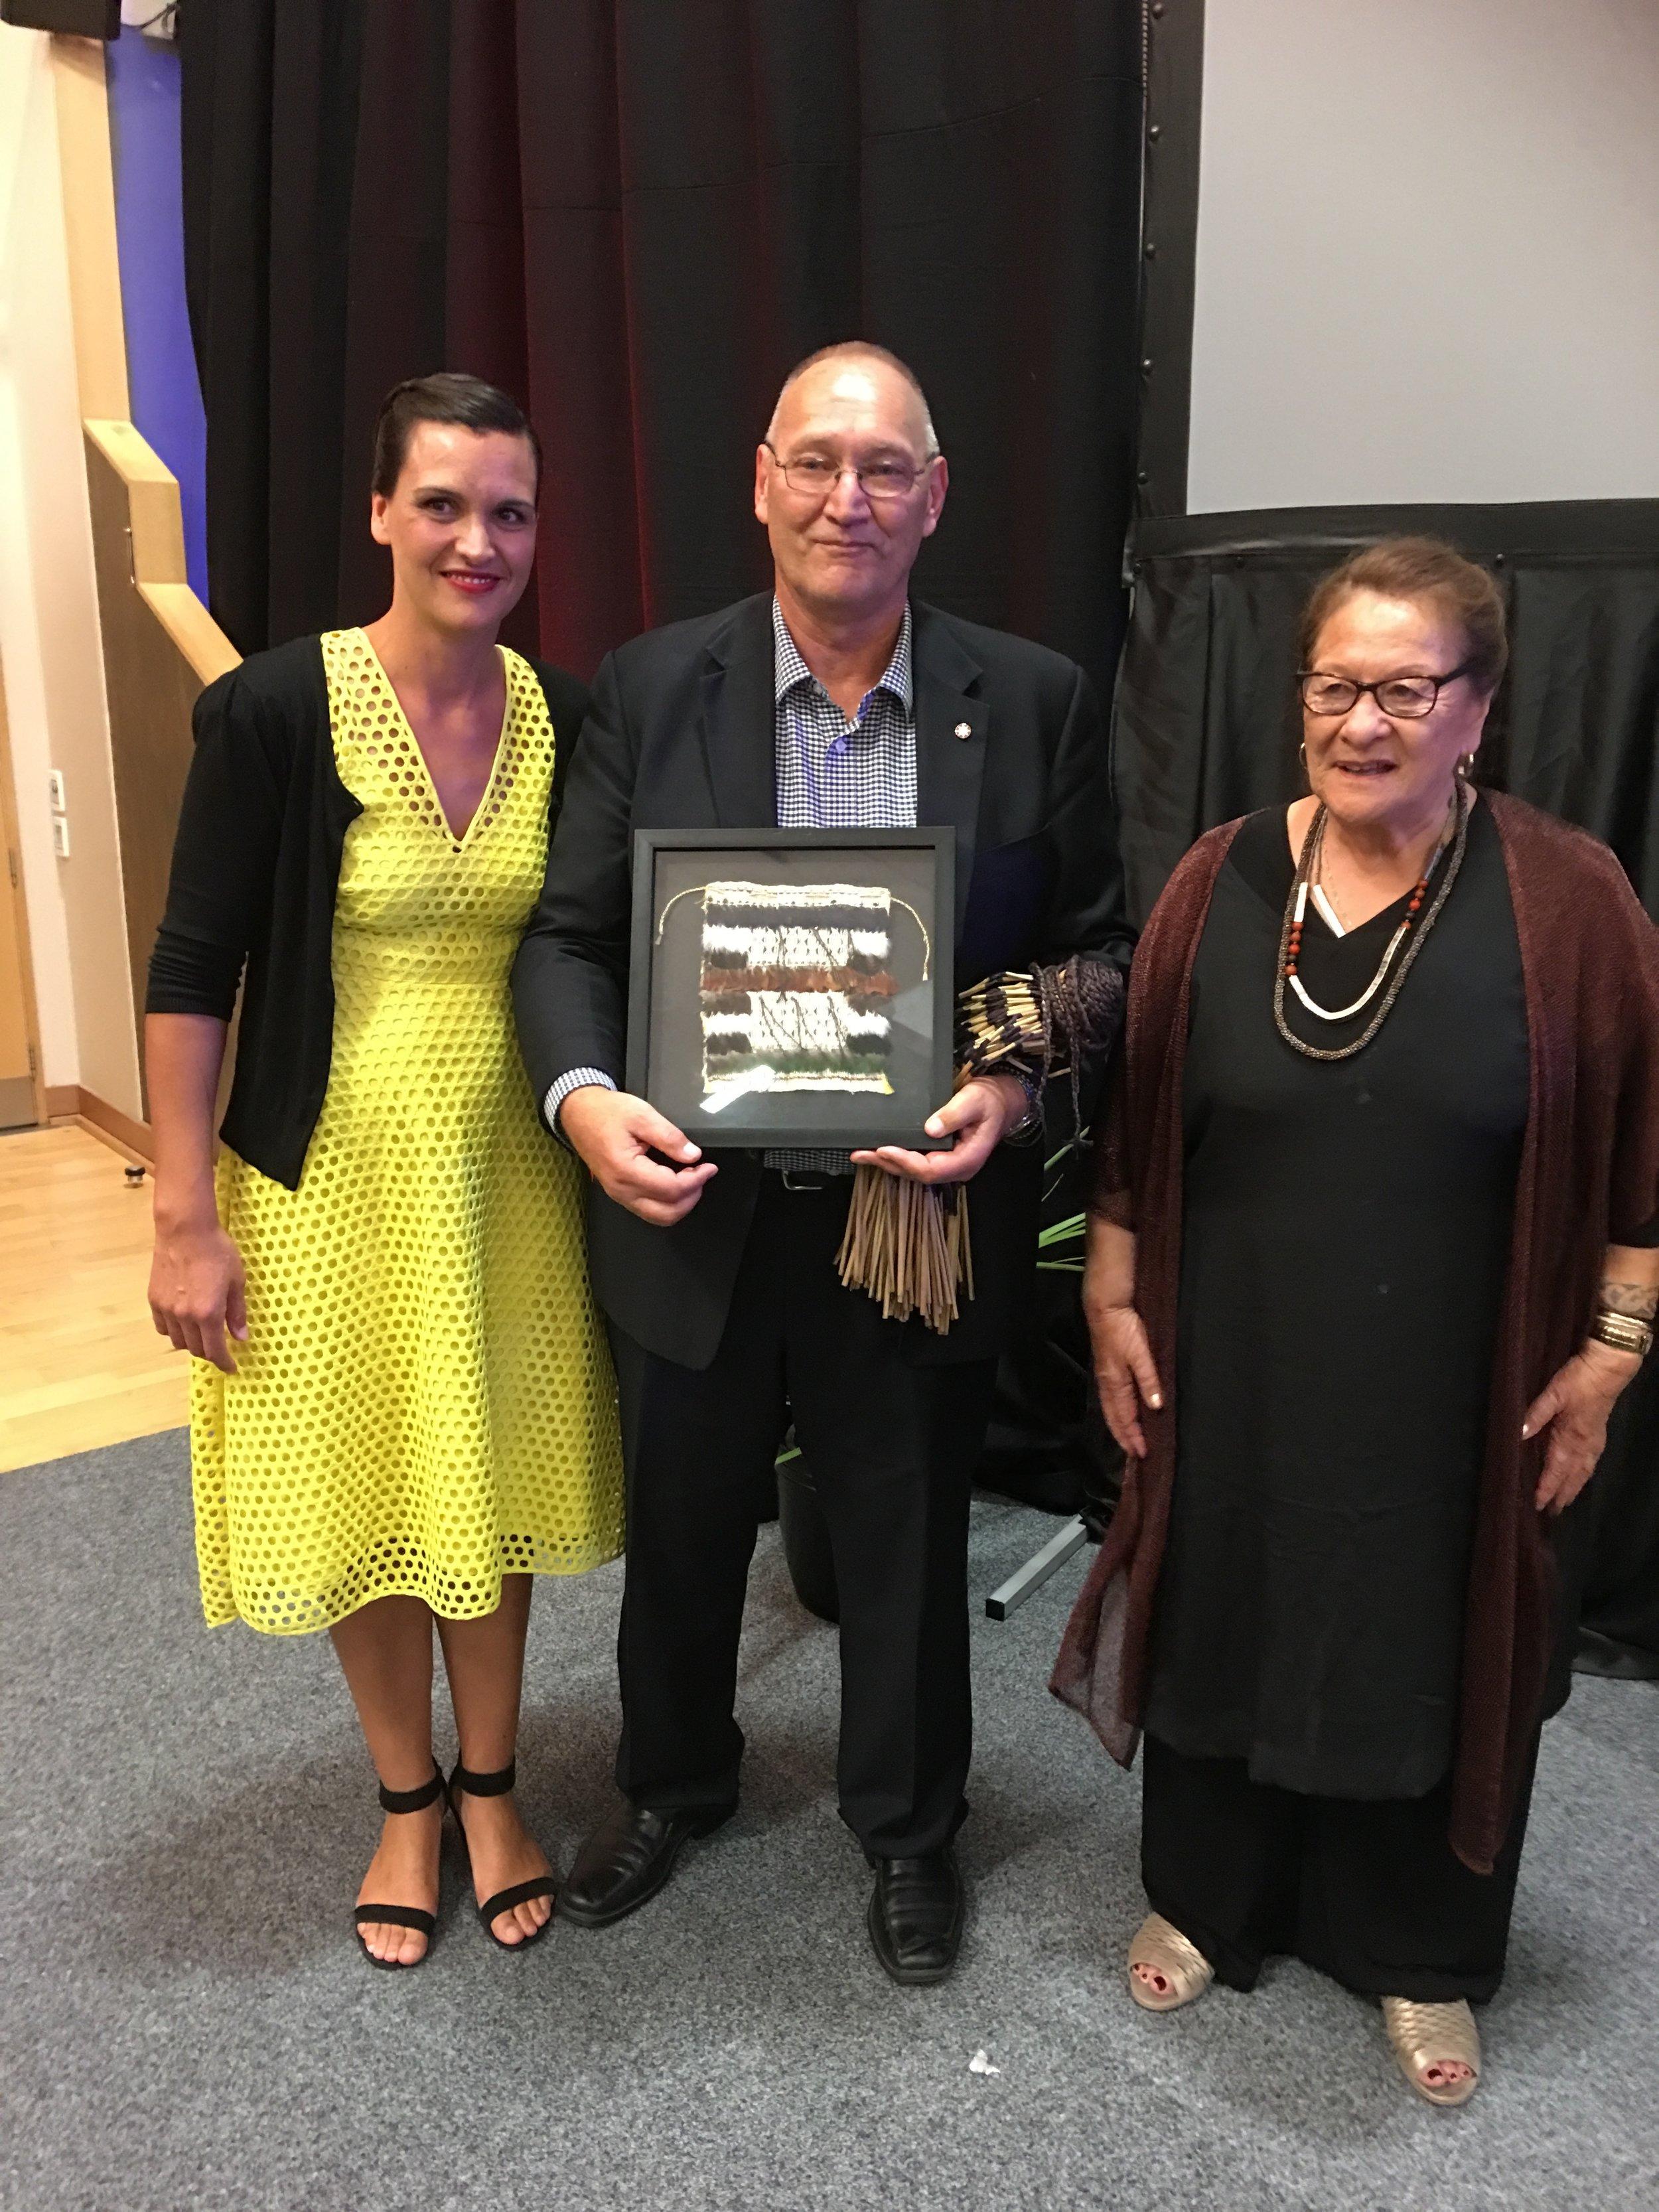 Koha for Ta Mark Solomon on behalf of Ngati Rarua, represented by Chair Olivia Hall and Whaea Molly Luke.